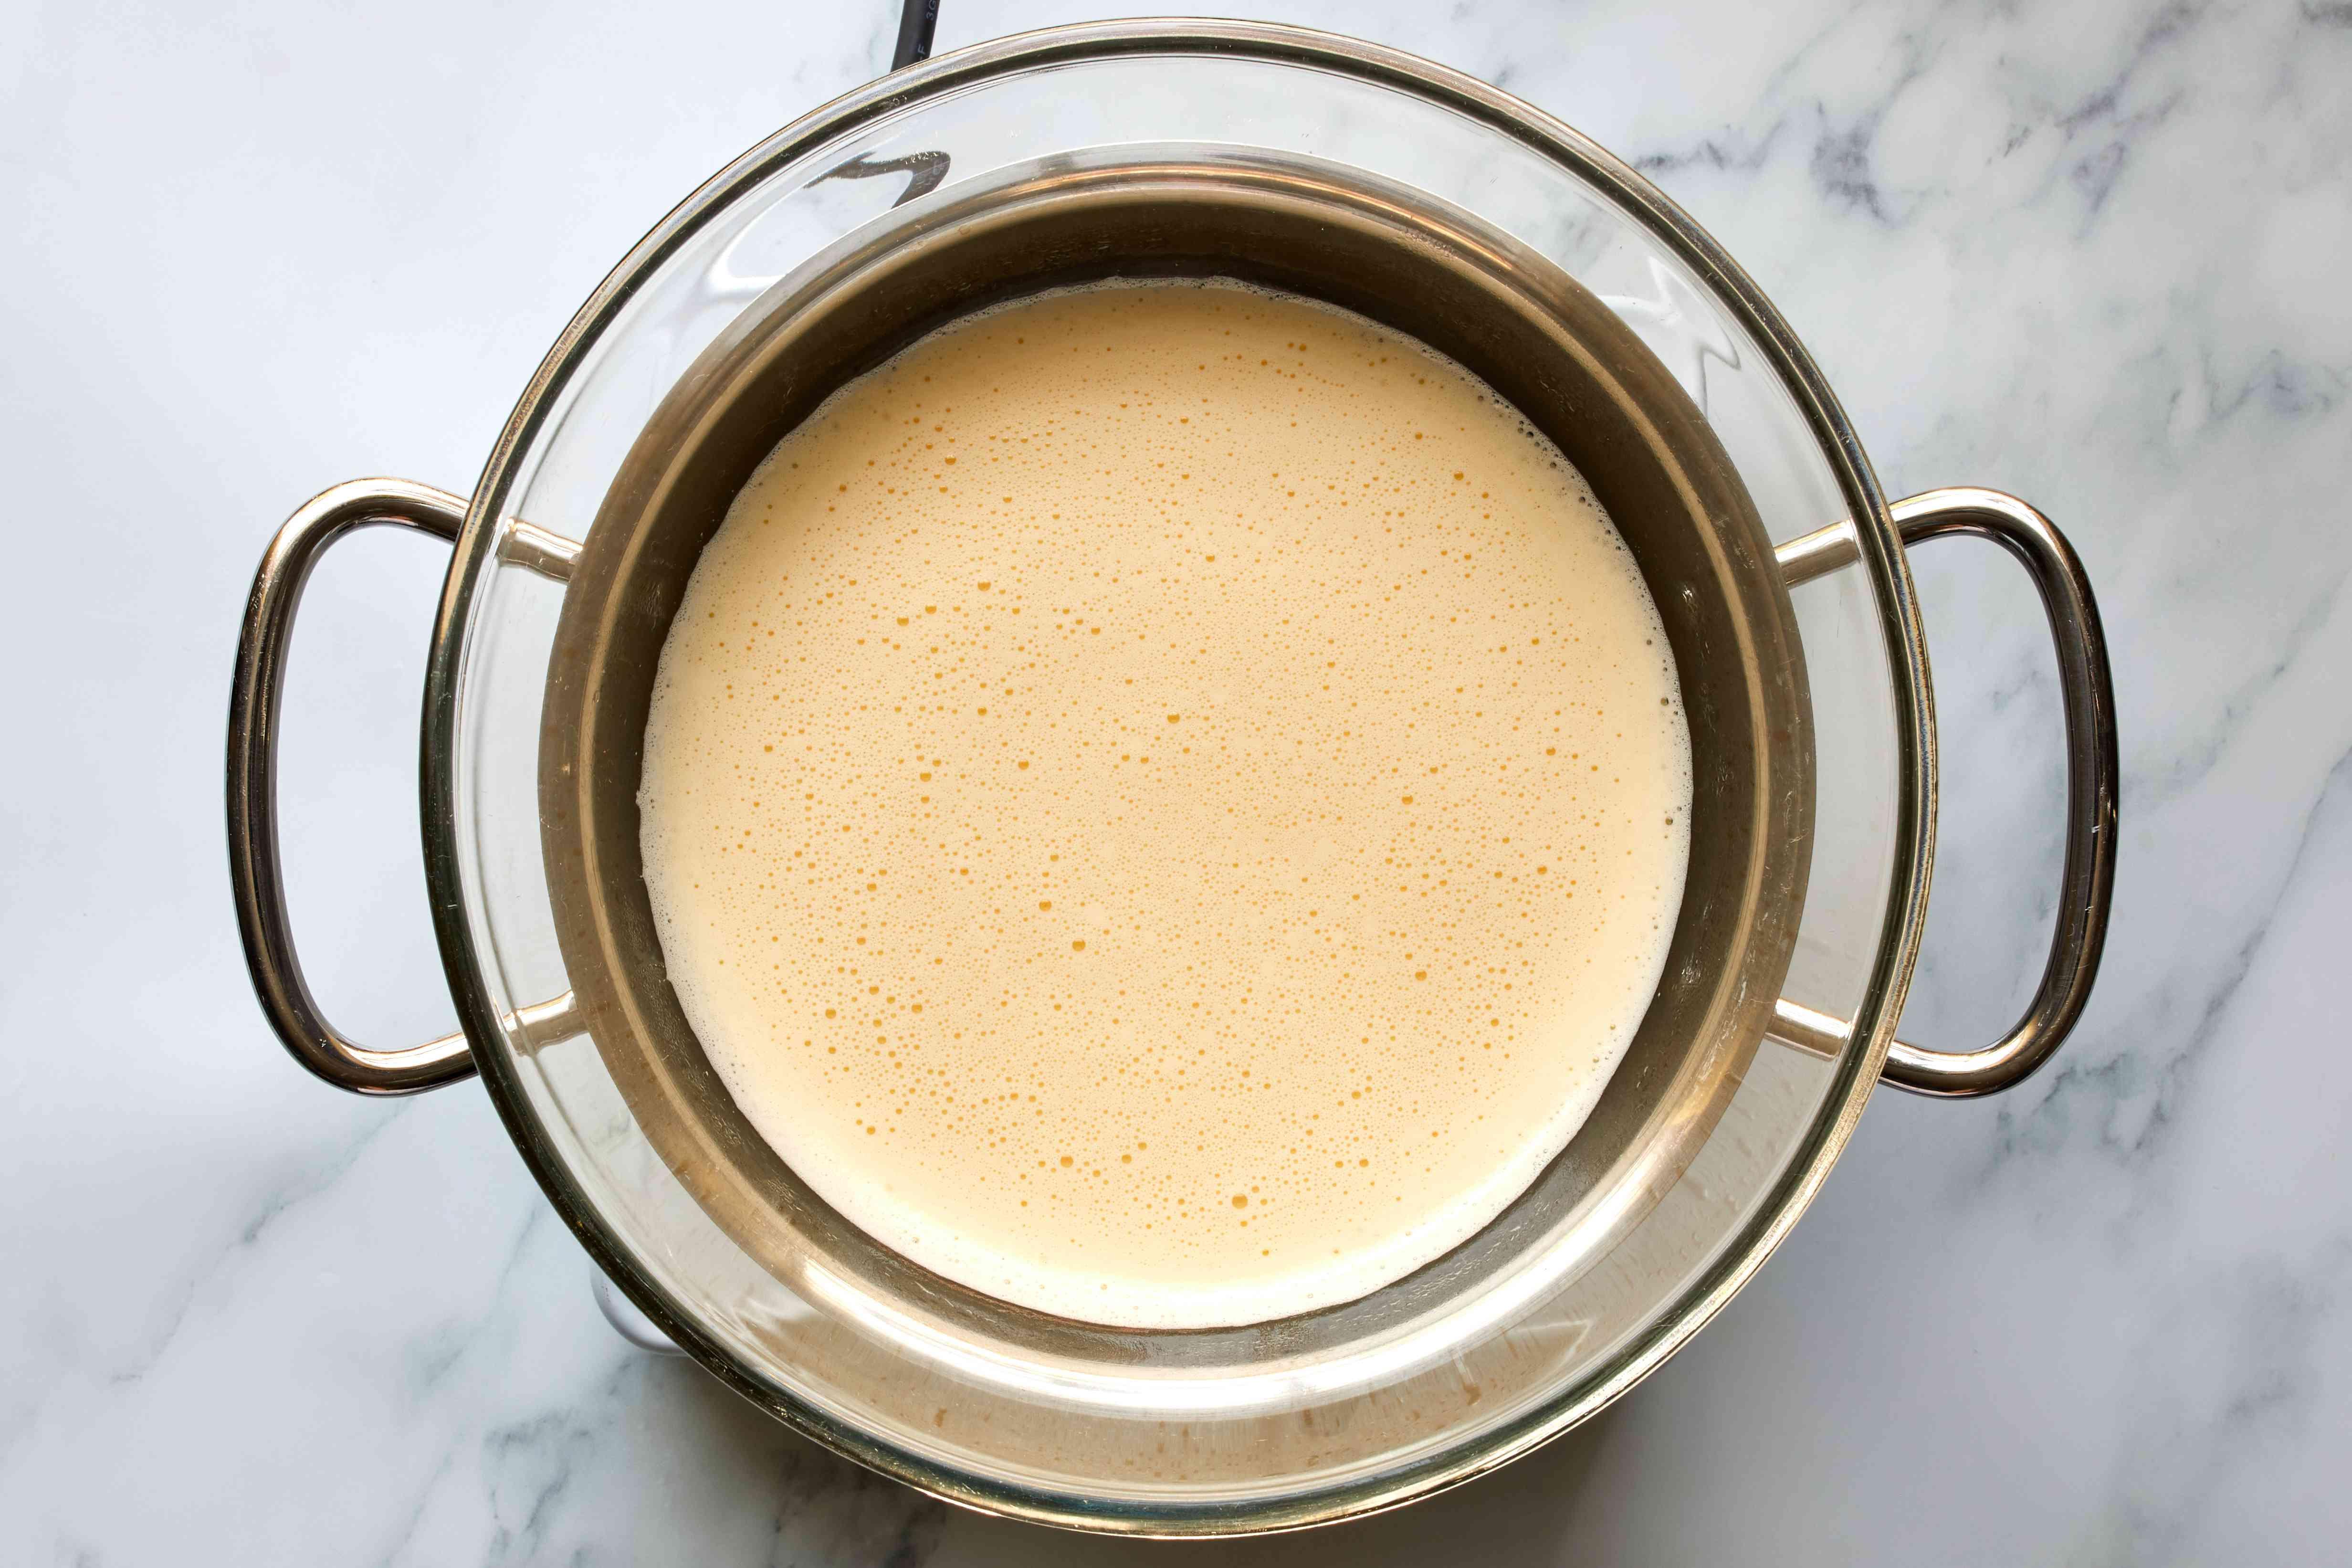 egg mixture into the top of a double-boiler